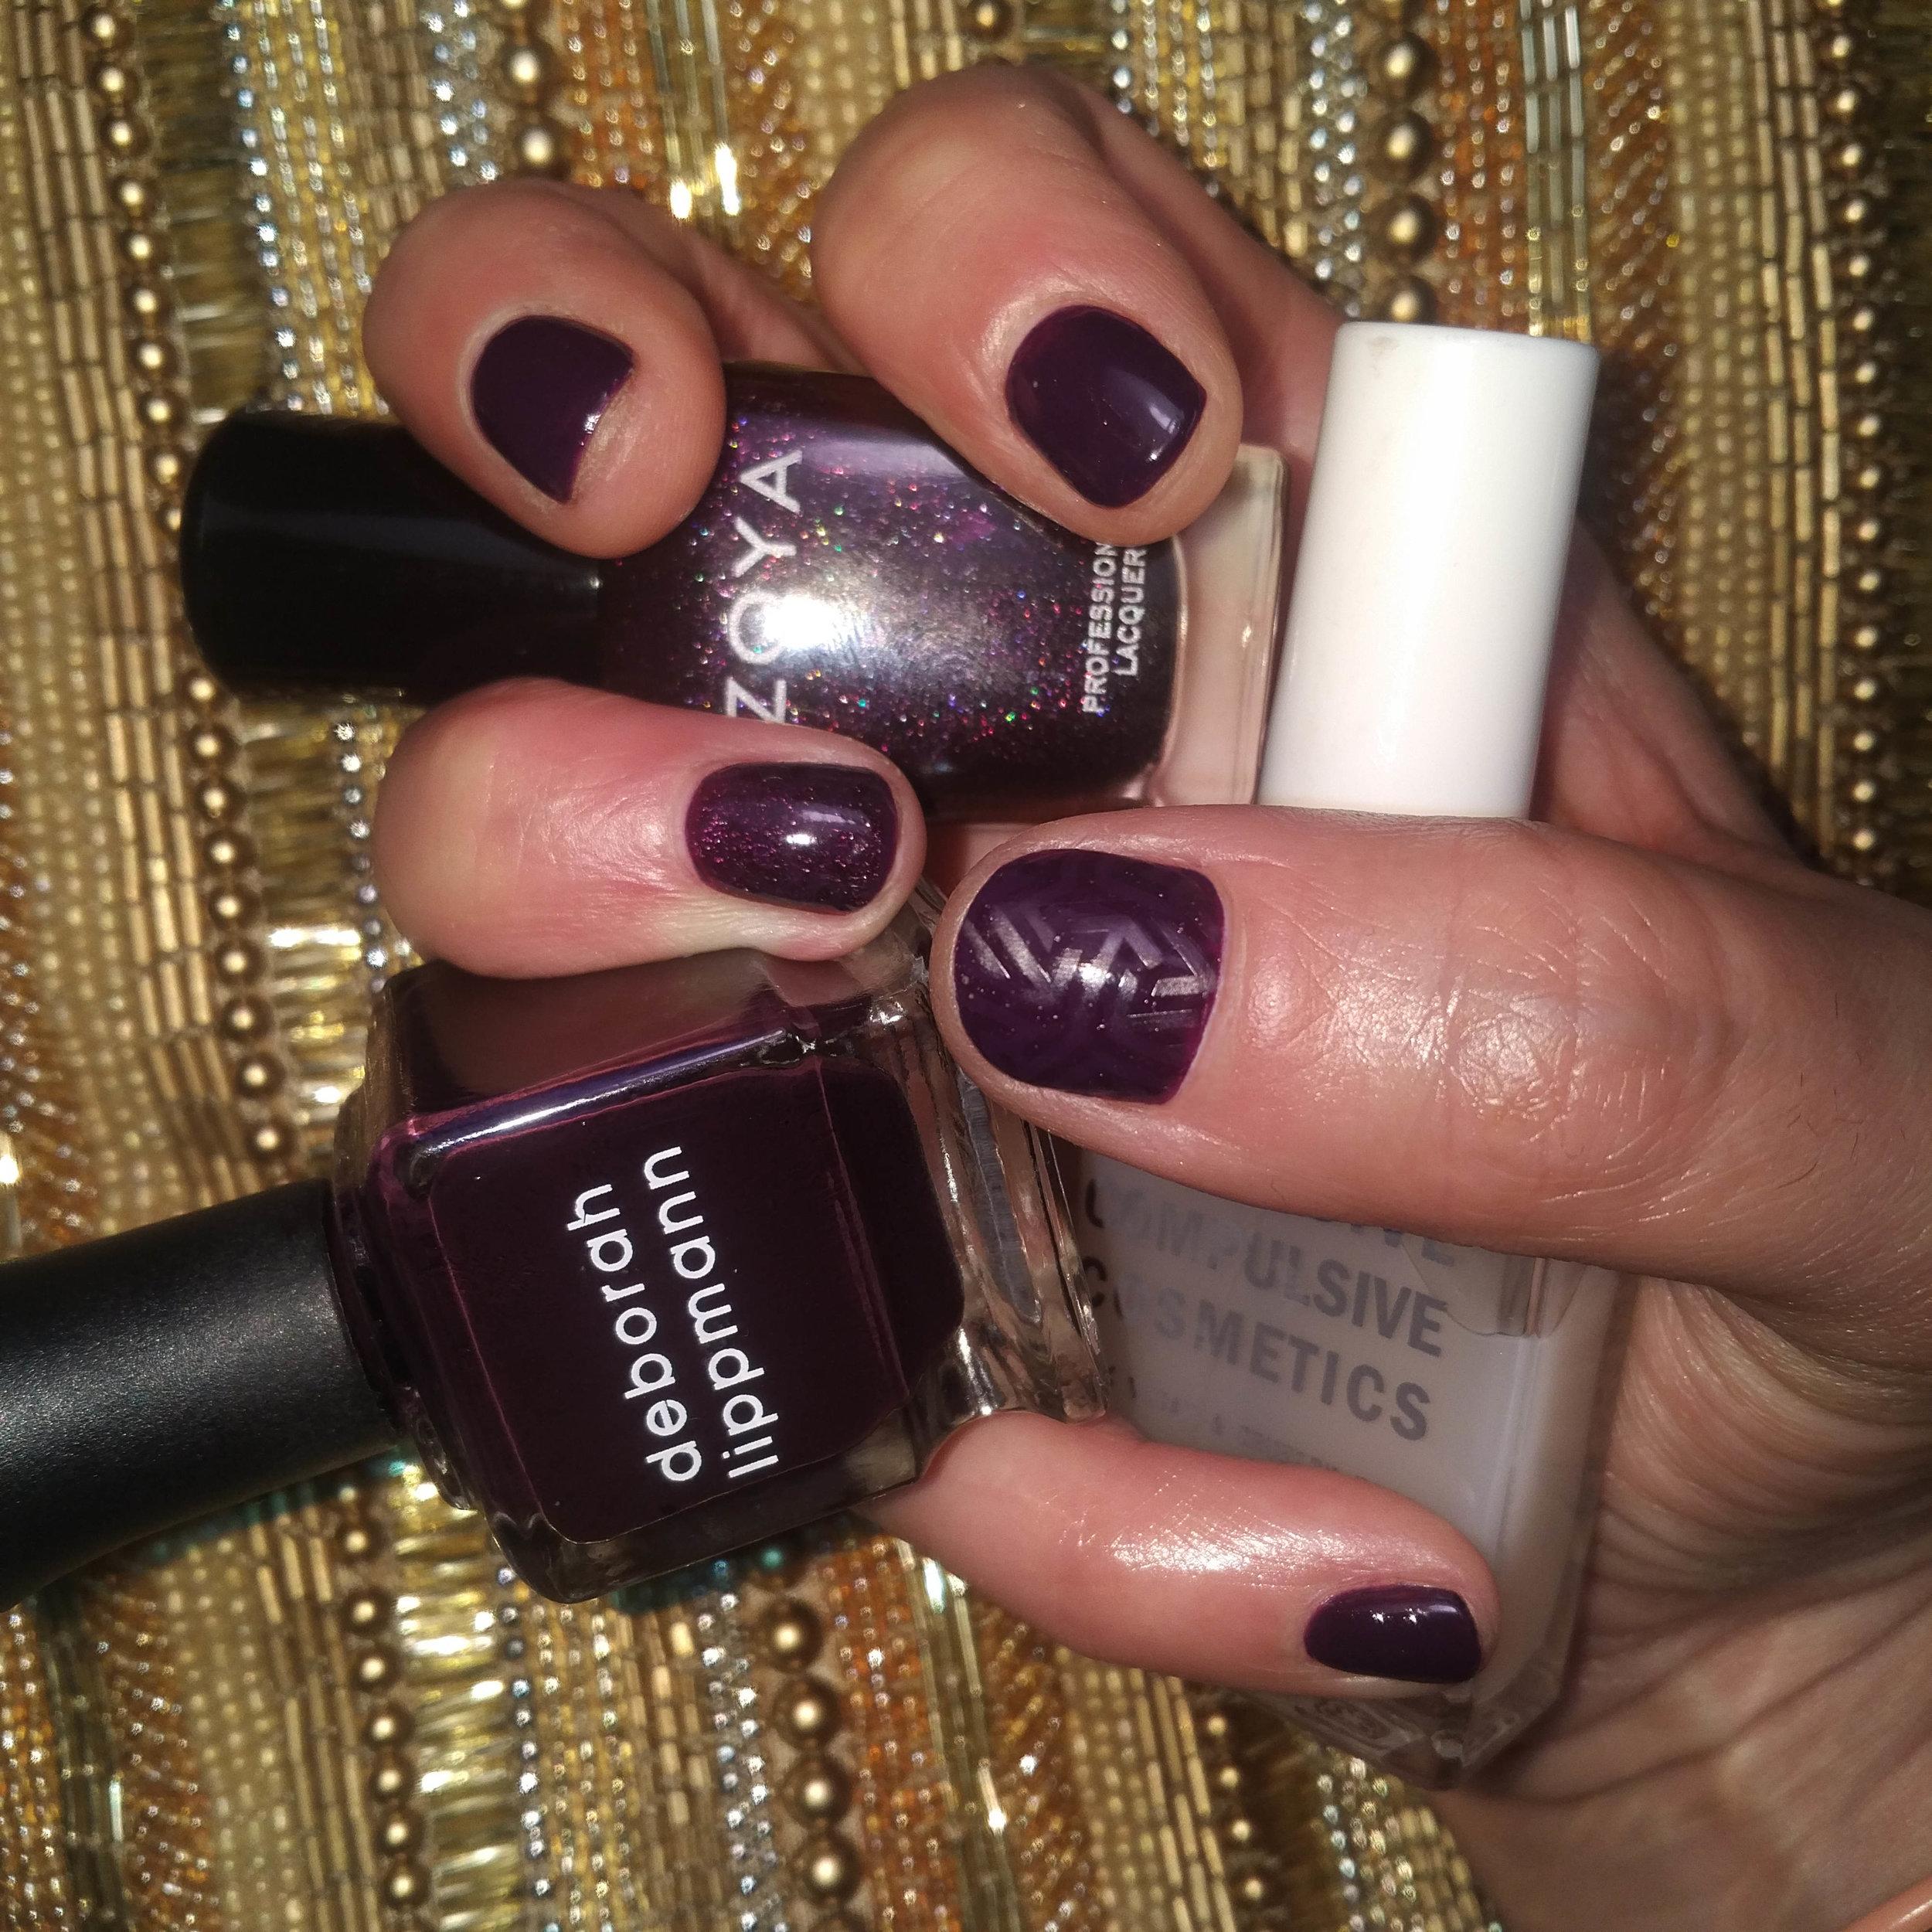 Stamping Nail Art Texture Matte OCC Zoya Deborah Lippmann Monochrome, Purple Nails, Goth Nails, Dark Nails, Vamp, Mani, Vamp Mani, Gel Nails,